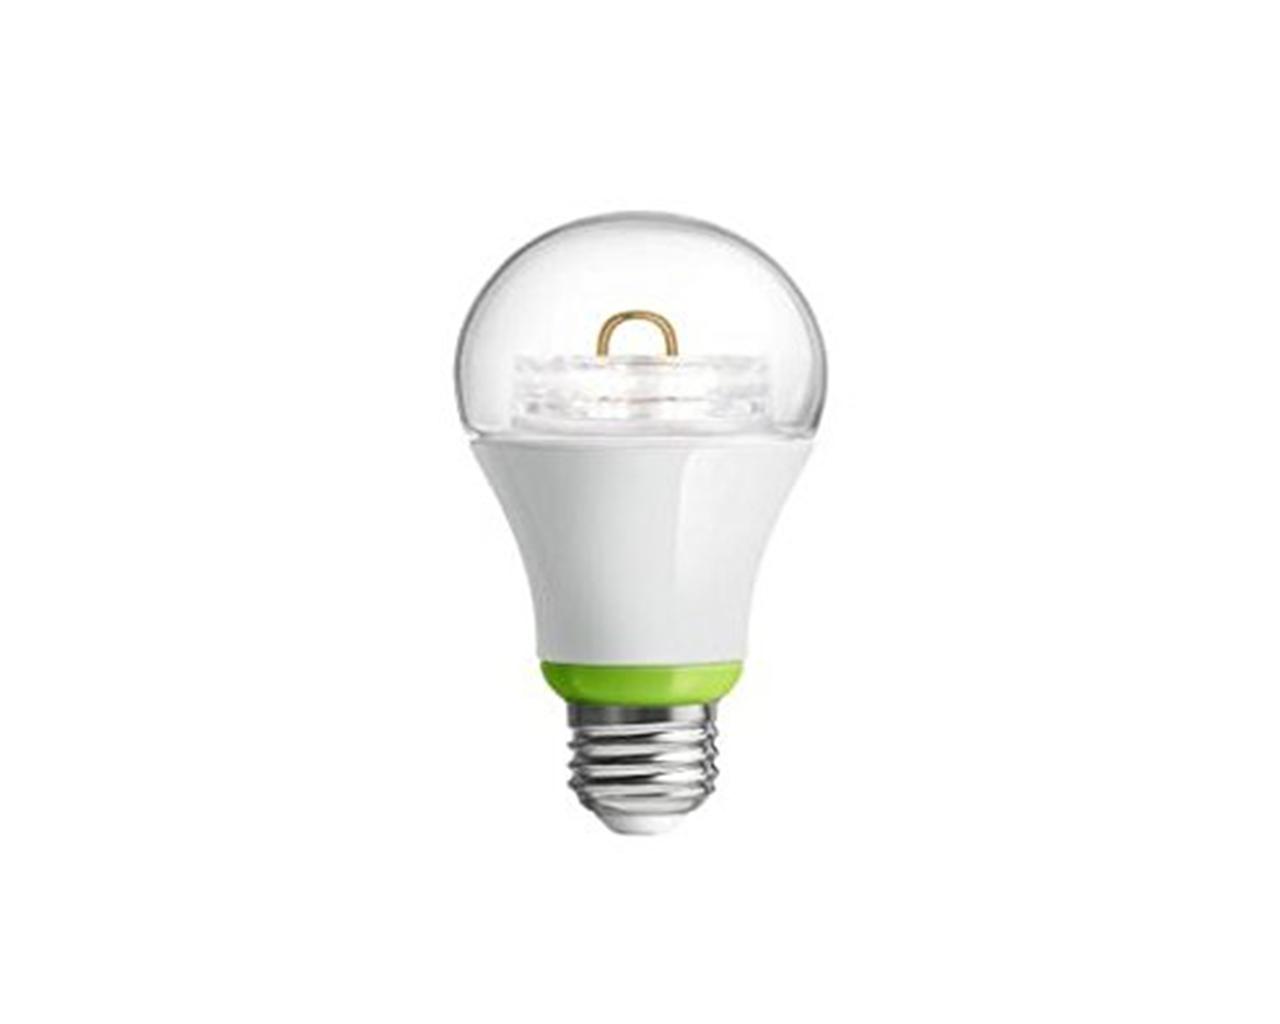 ge-link-smart-led-light-bulb